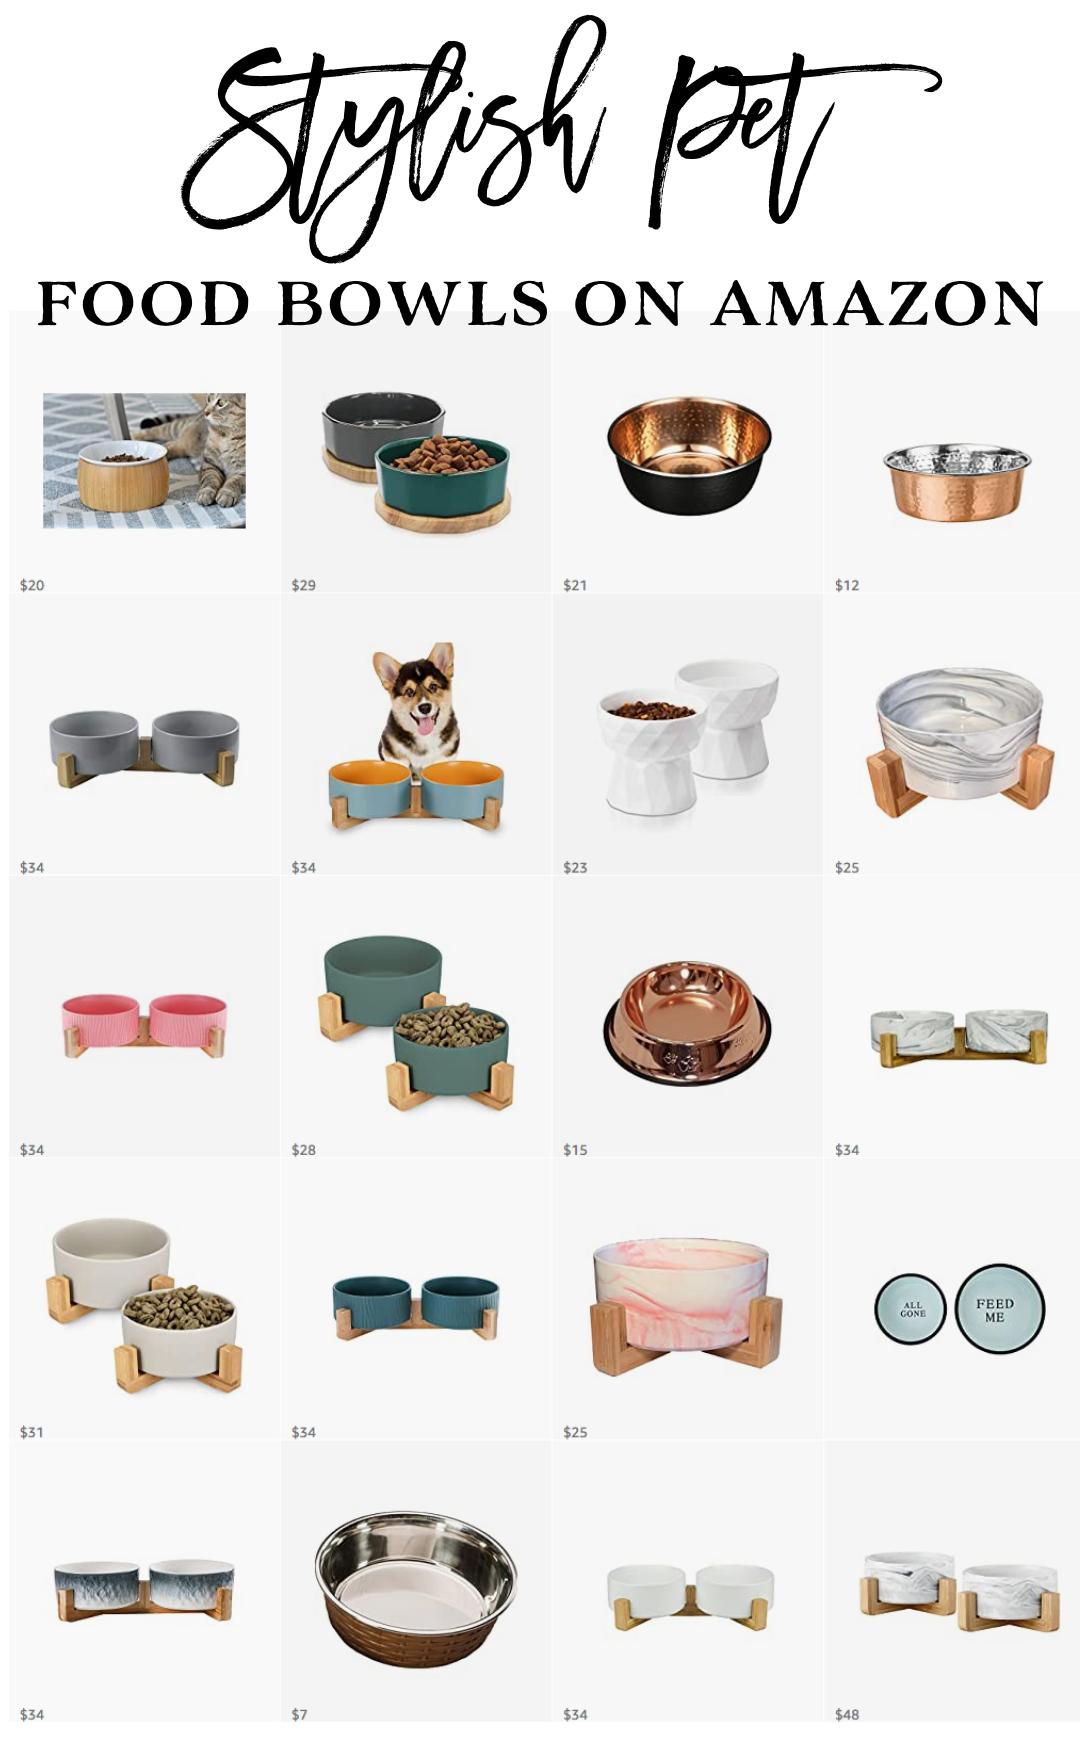 Stylish-Dog-Accessories-Food-Bowls